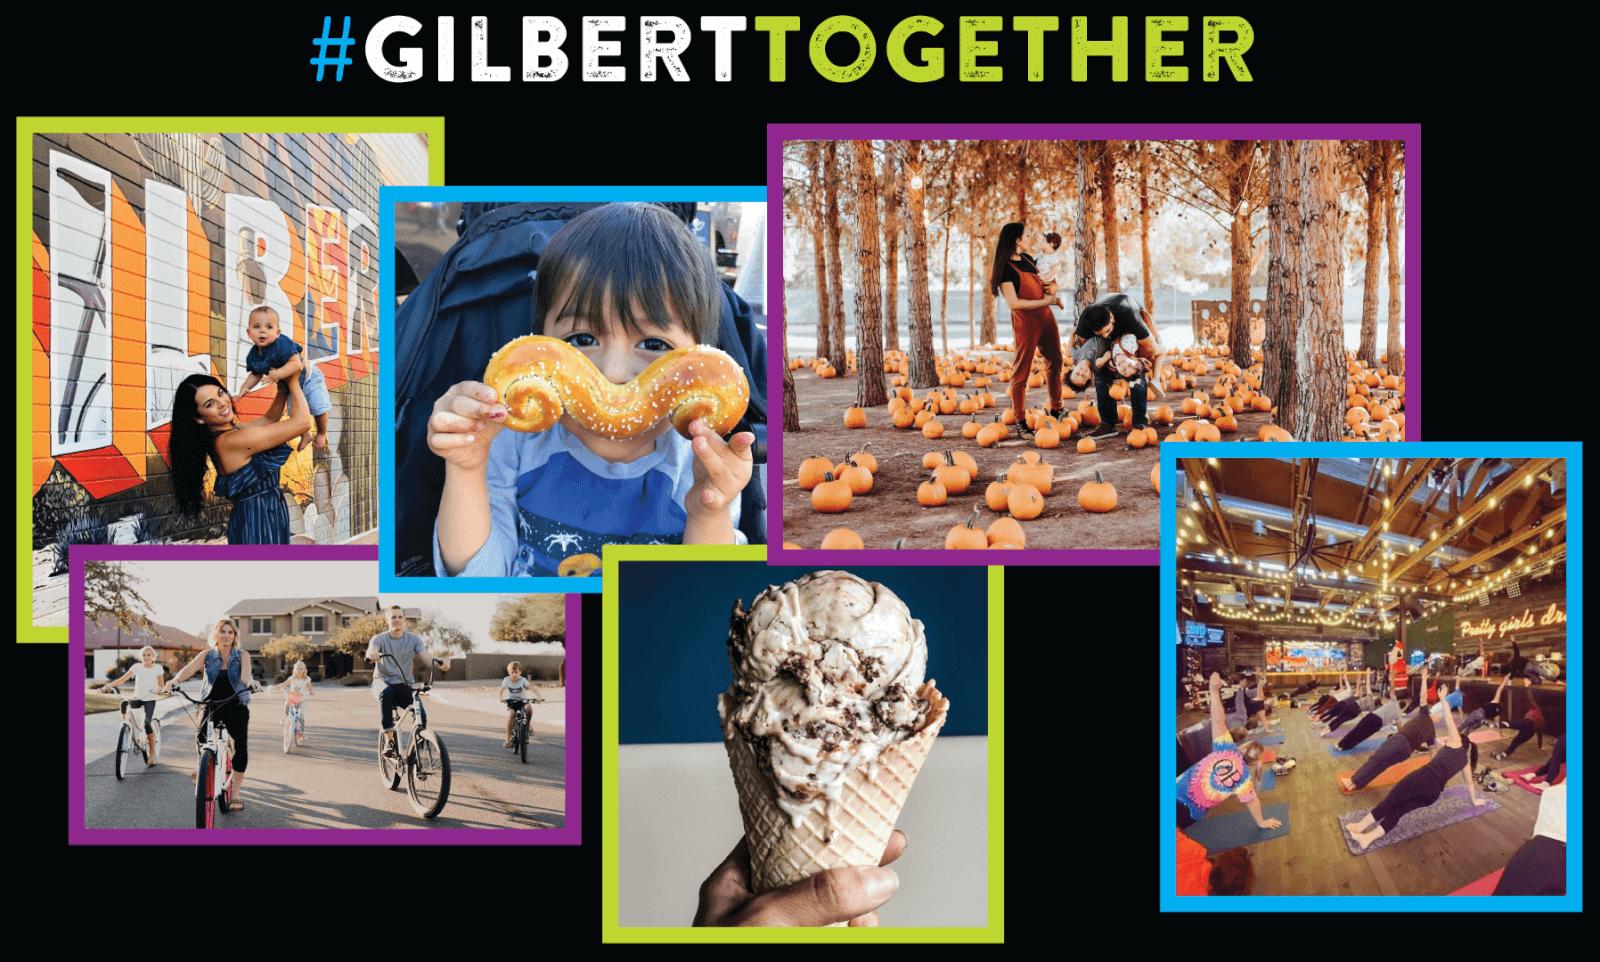 #GilbertTogether